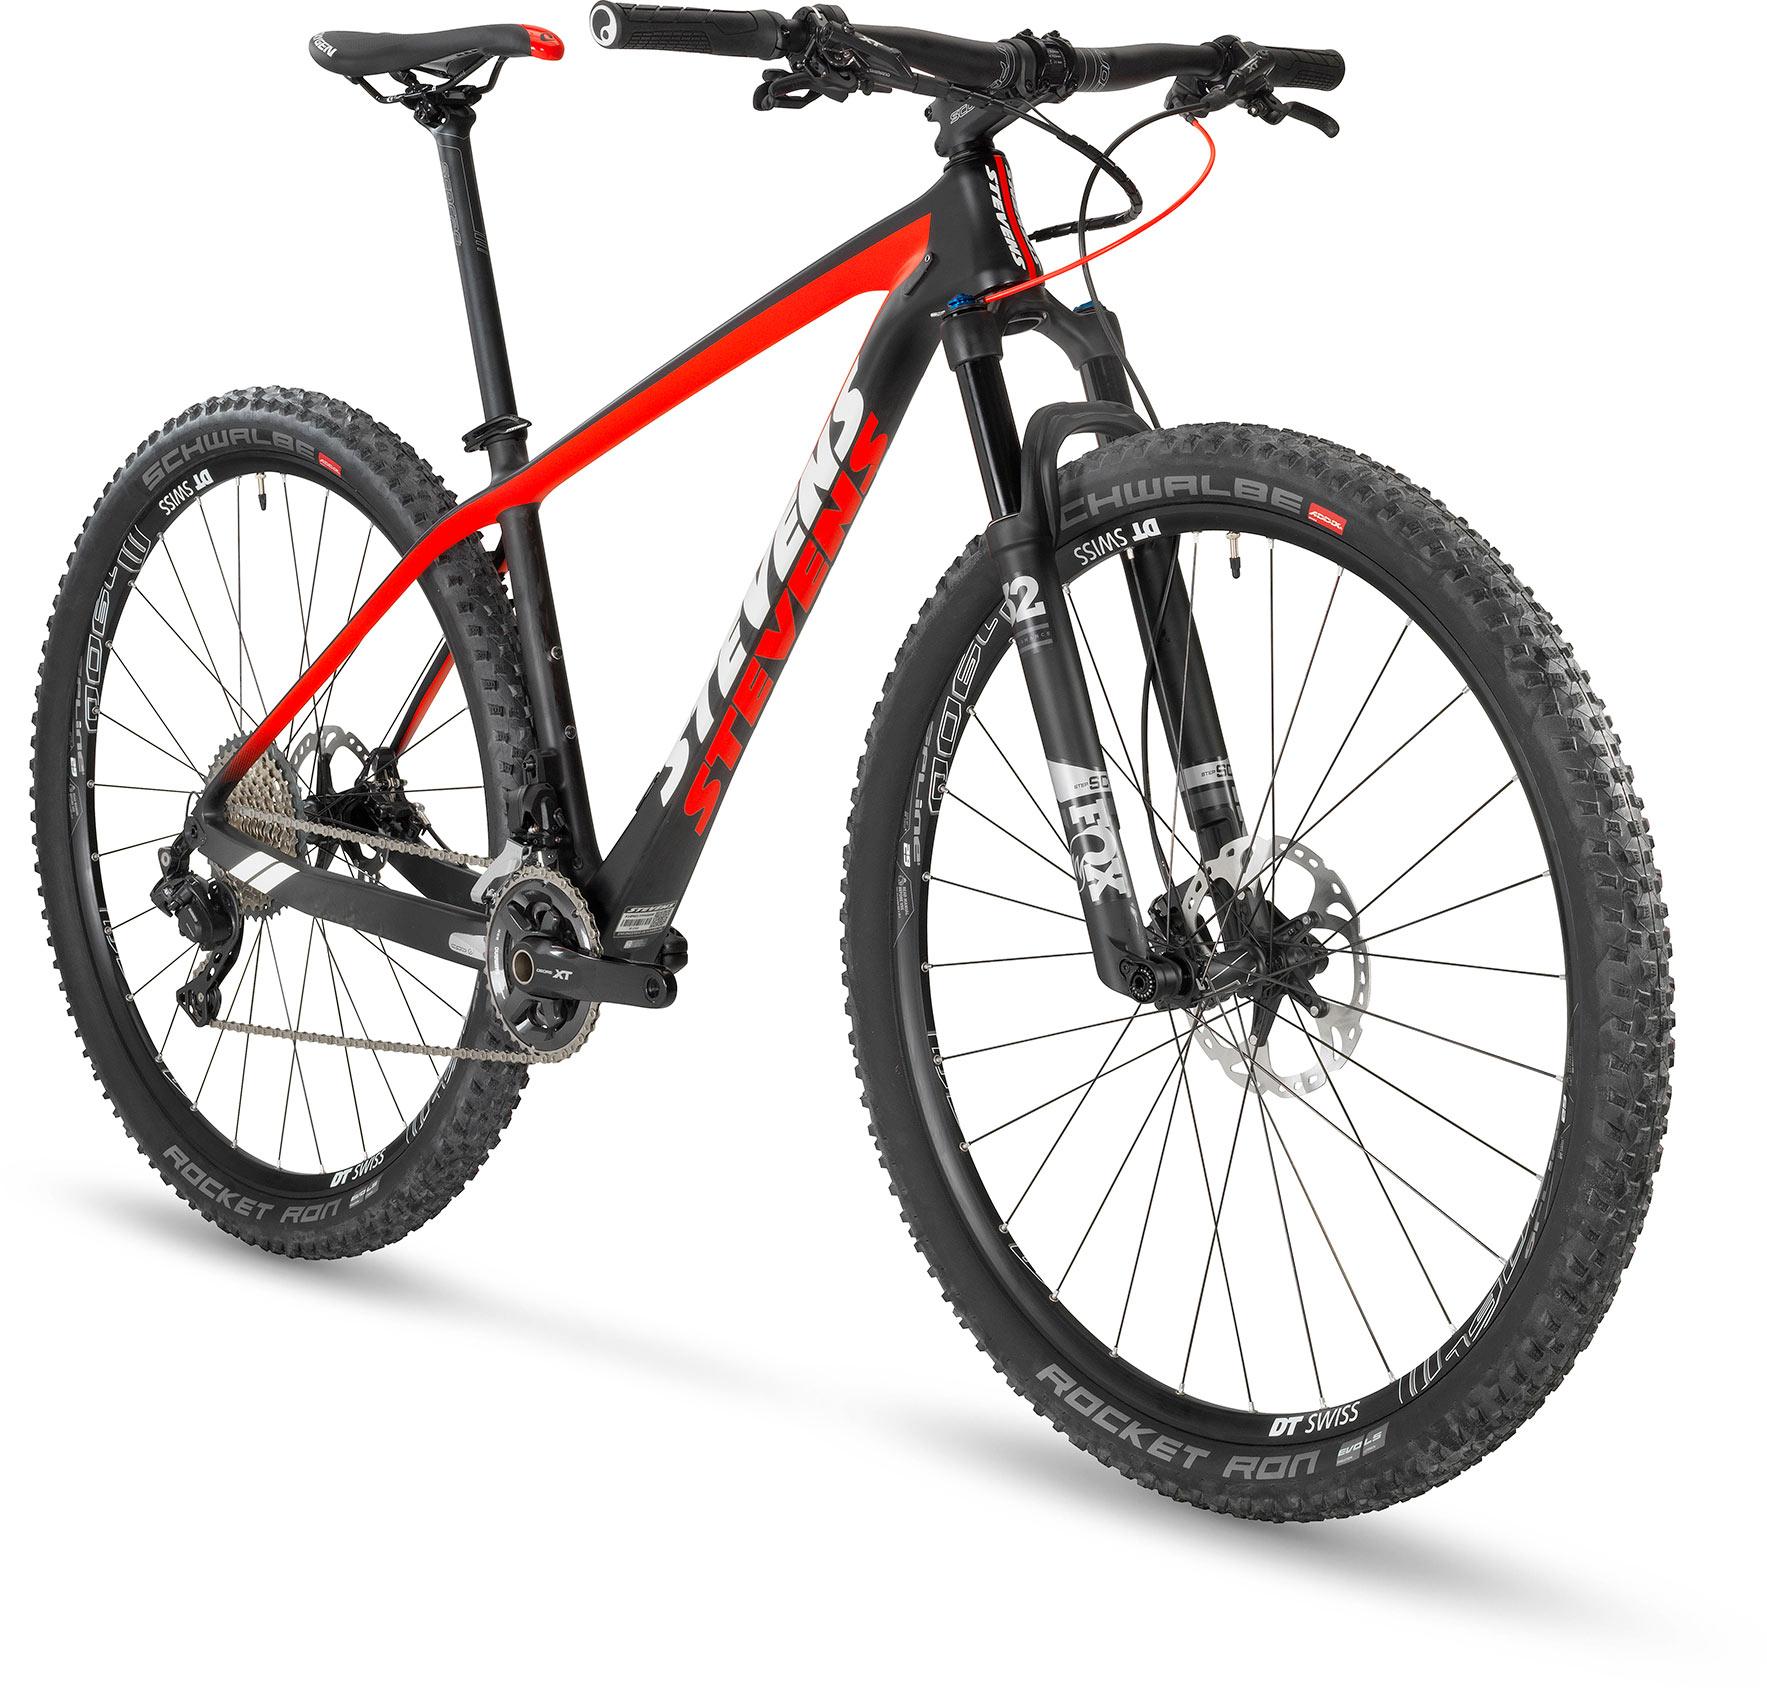 XC Carbon - Stevens Bikes 2018